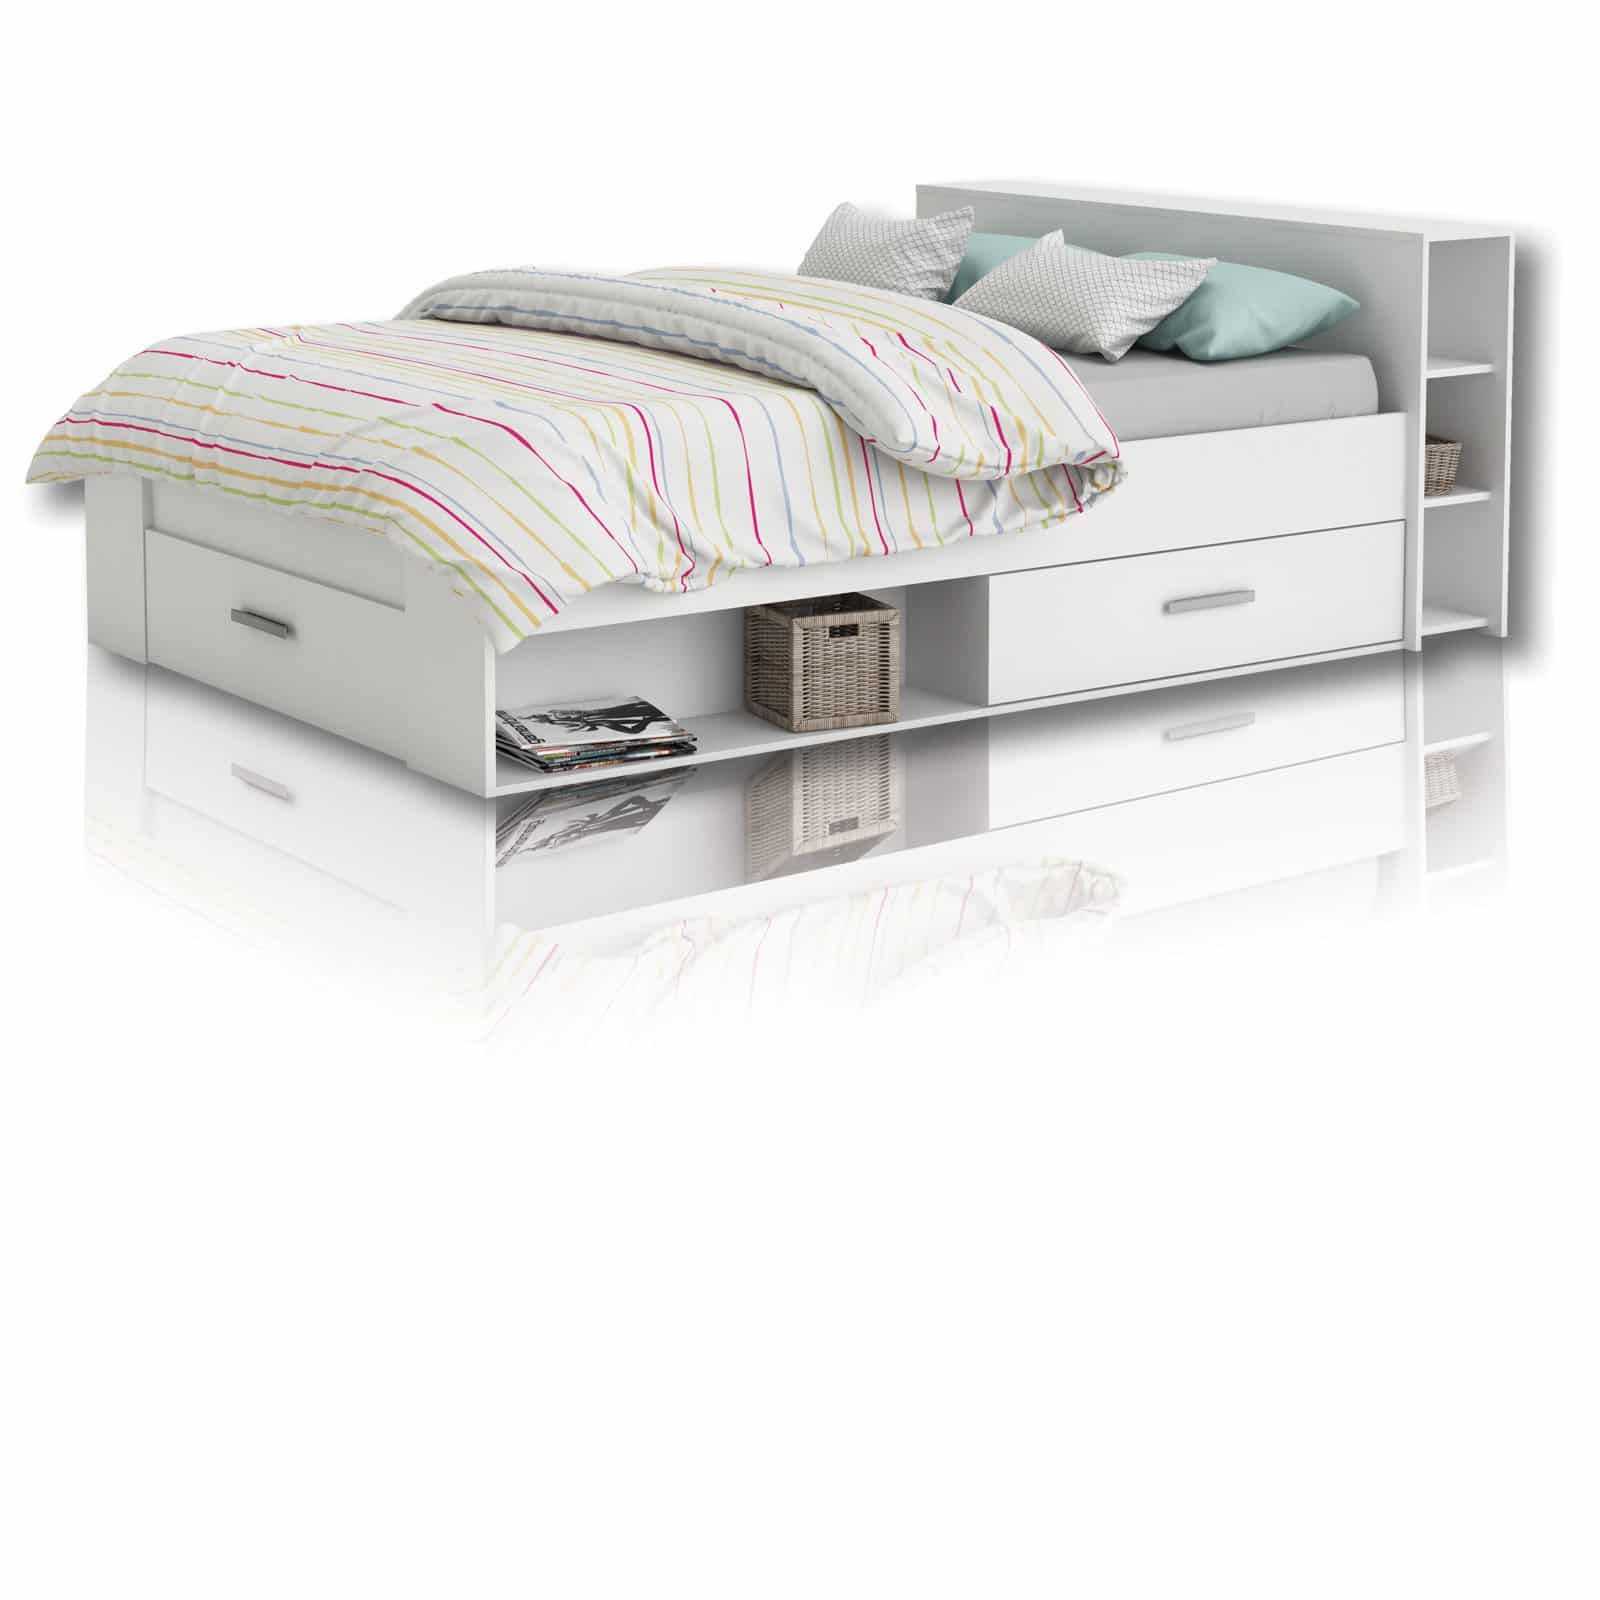 Jugendbett Funktionsbett Pocket Weiss 140x200 Cm Bett 120x200